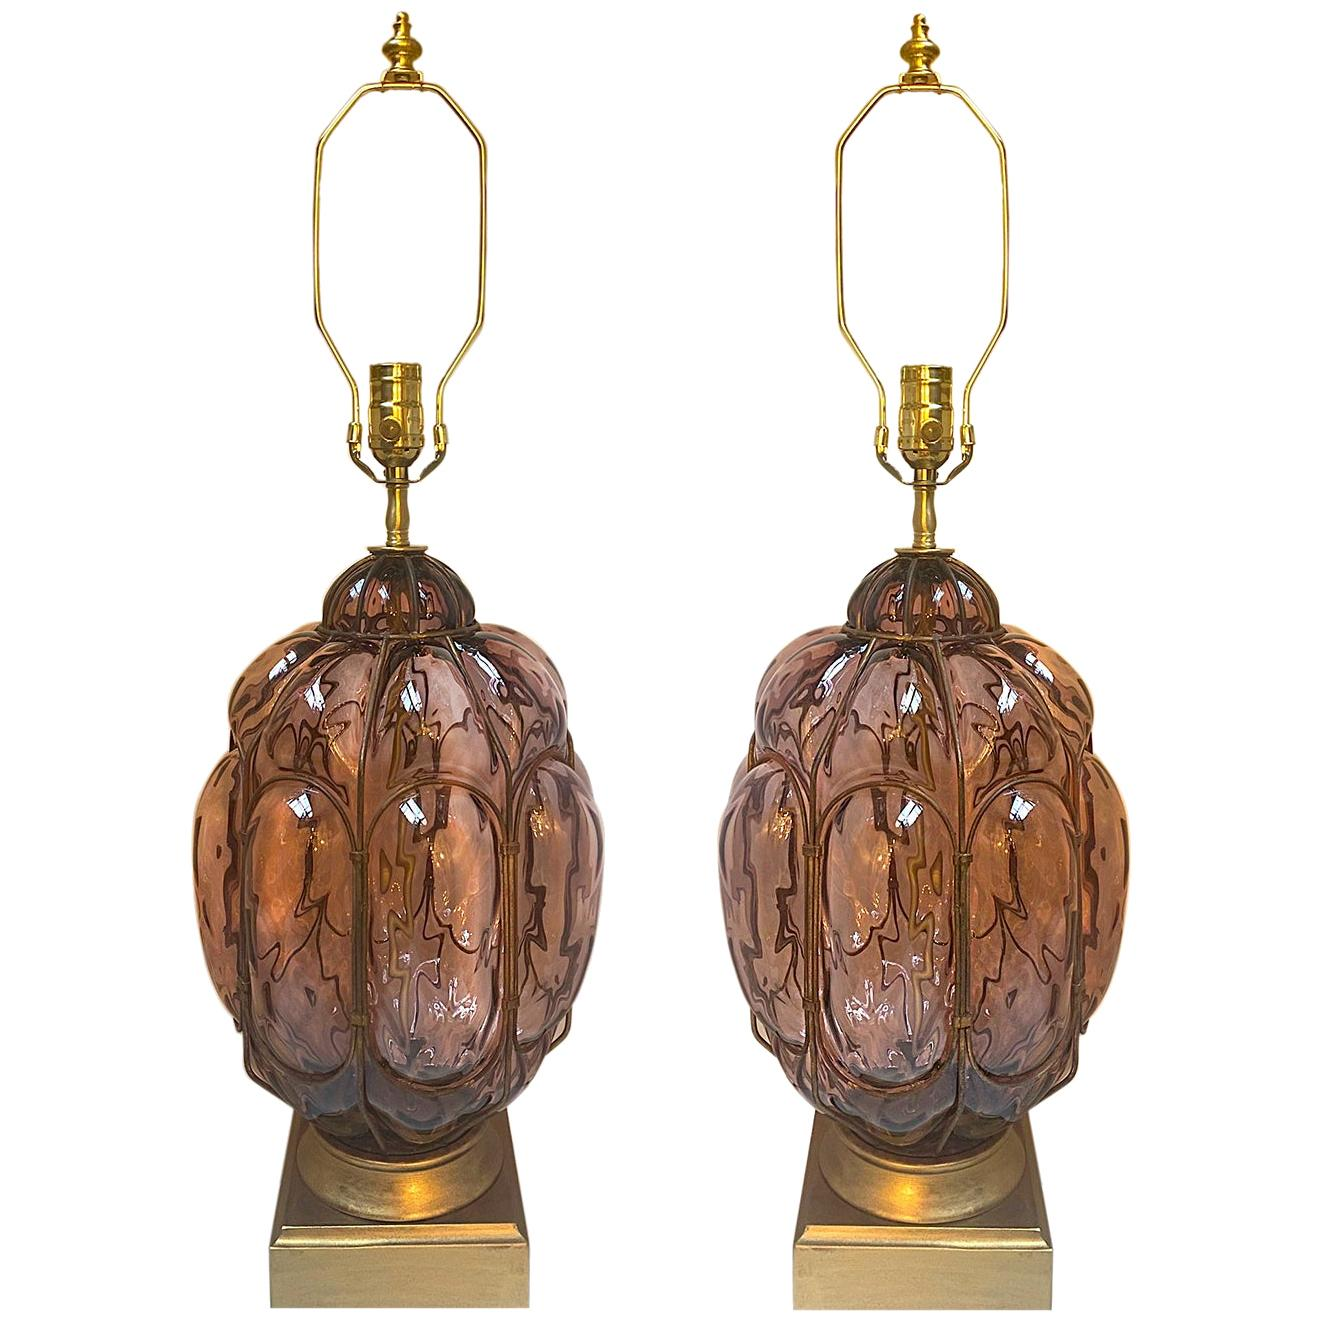 Pair of Italian Amethyst Glass Table Lamps